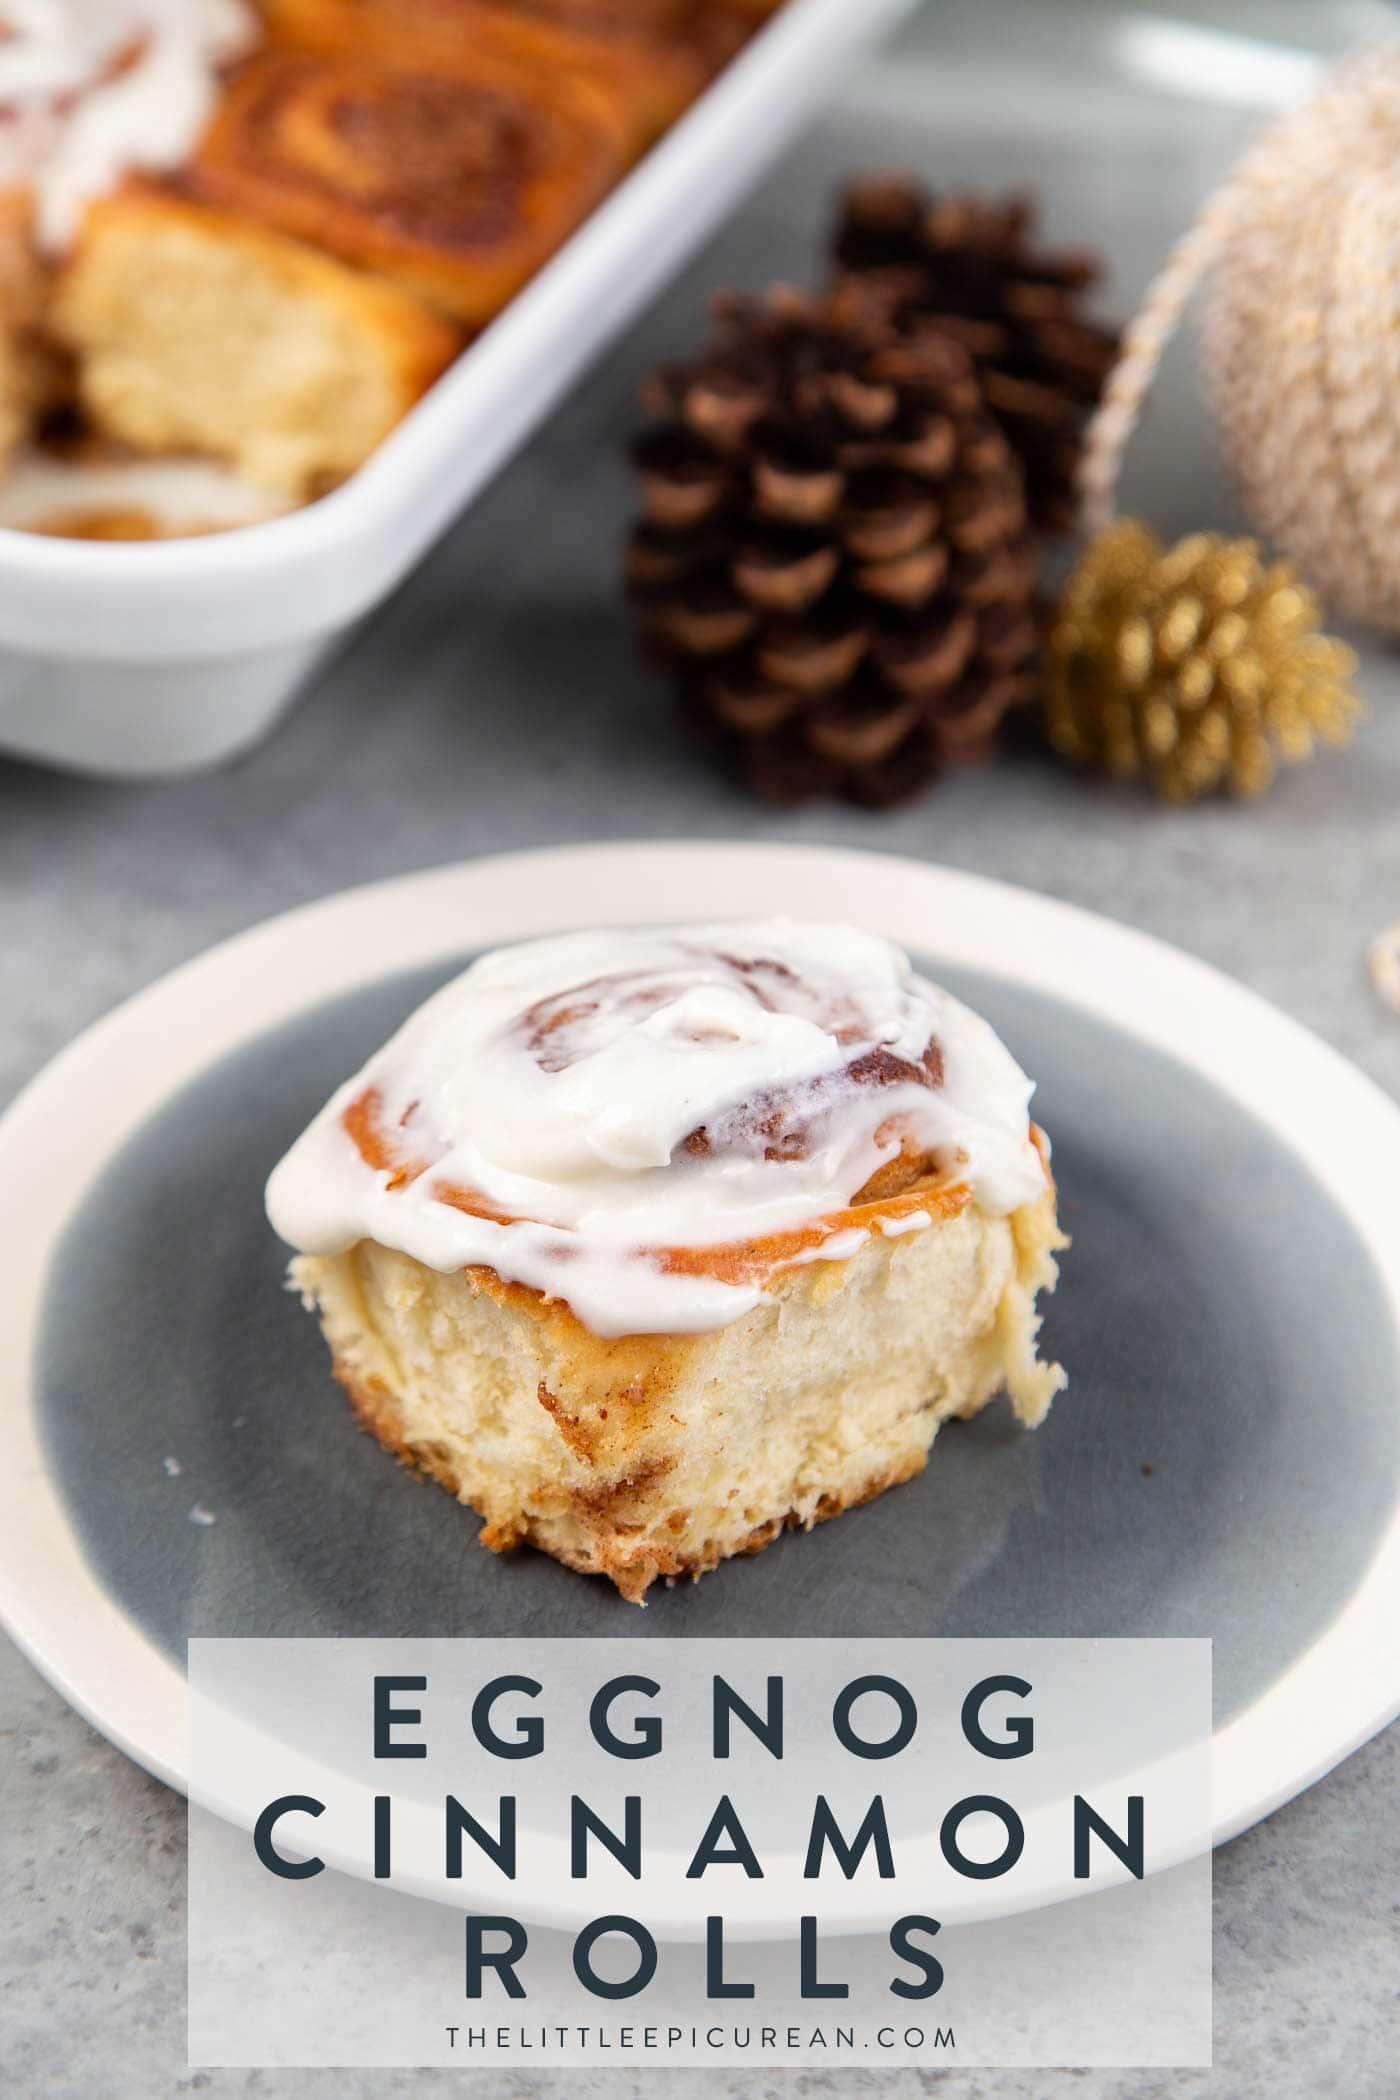 Eggnog Cinnamon Rolls with bourbon spiked glaze